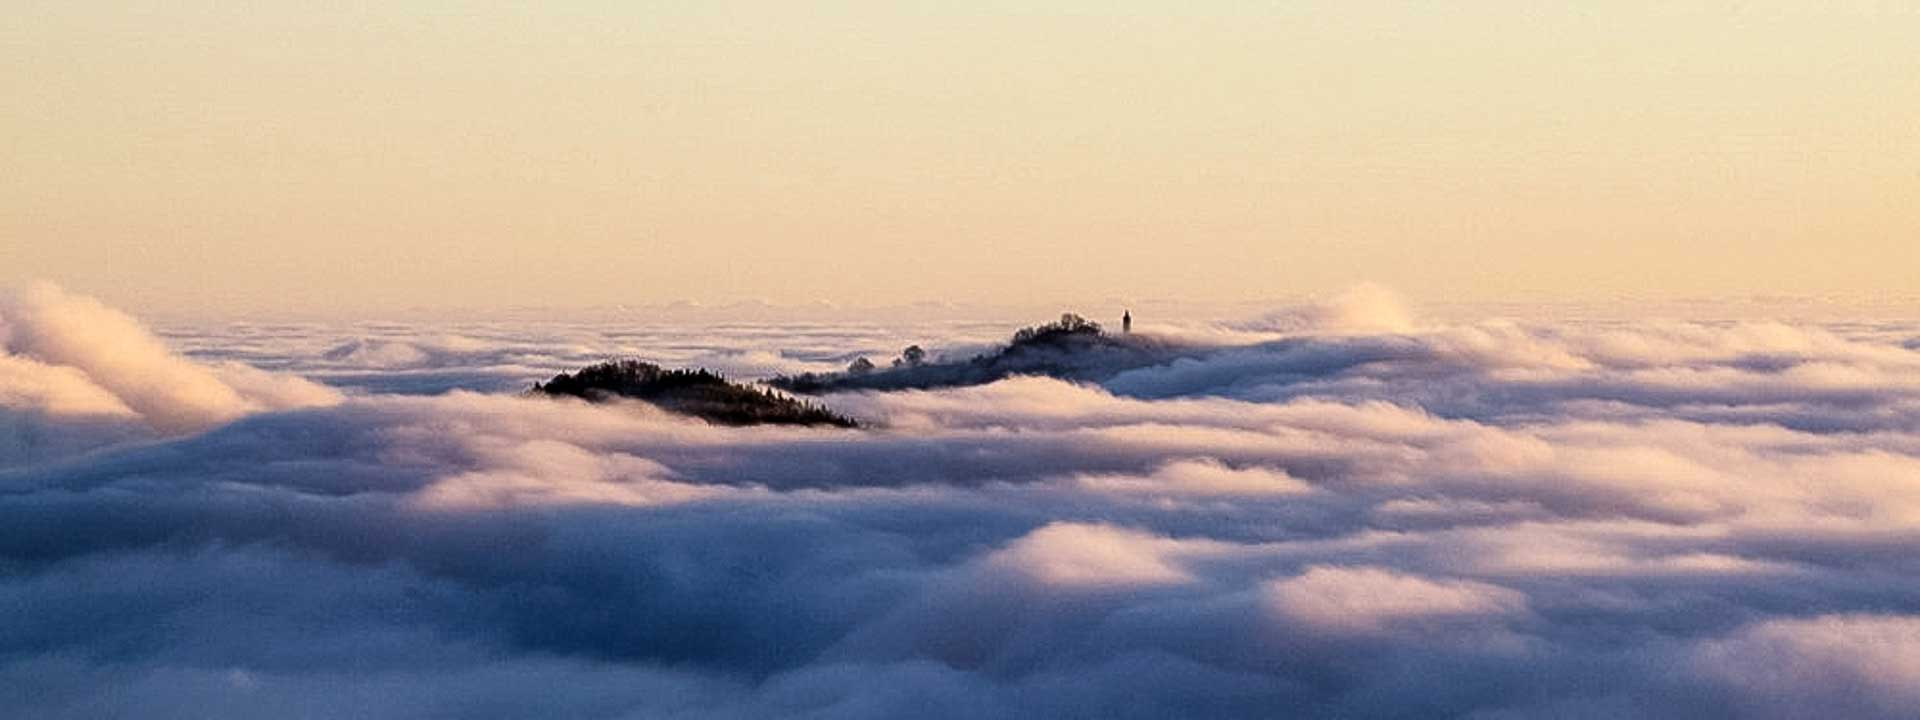 veduta-caltravaglio-nuvole